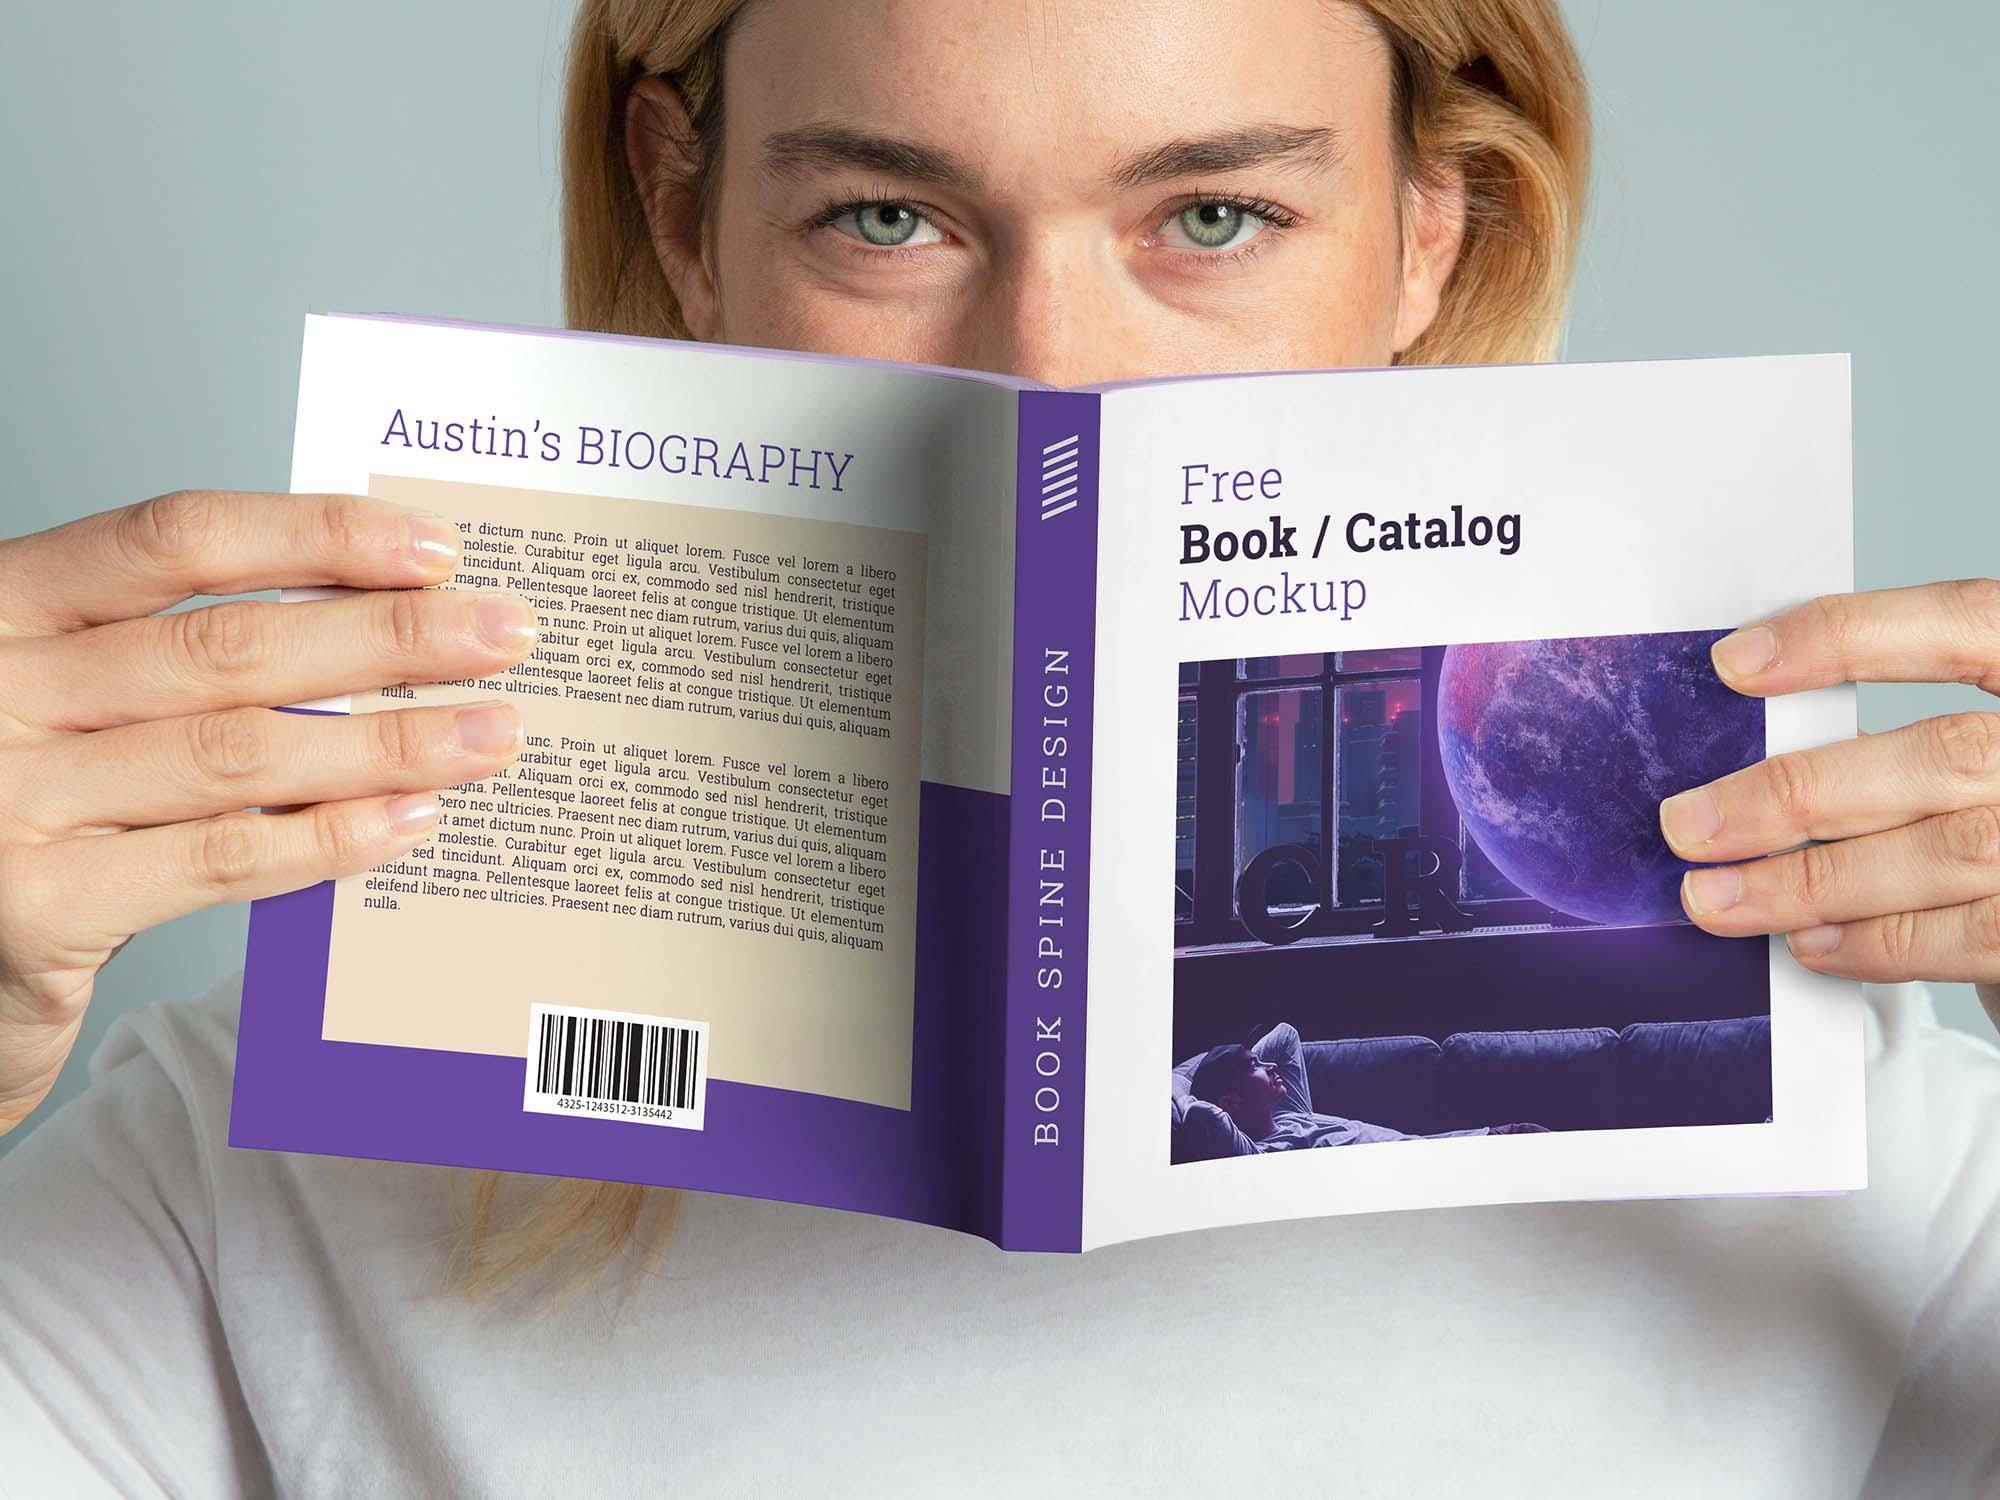 mockup livro free gratis para download 5 designe 1